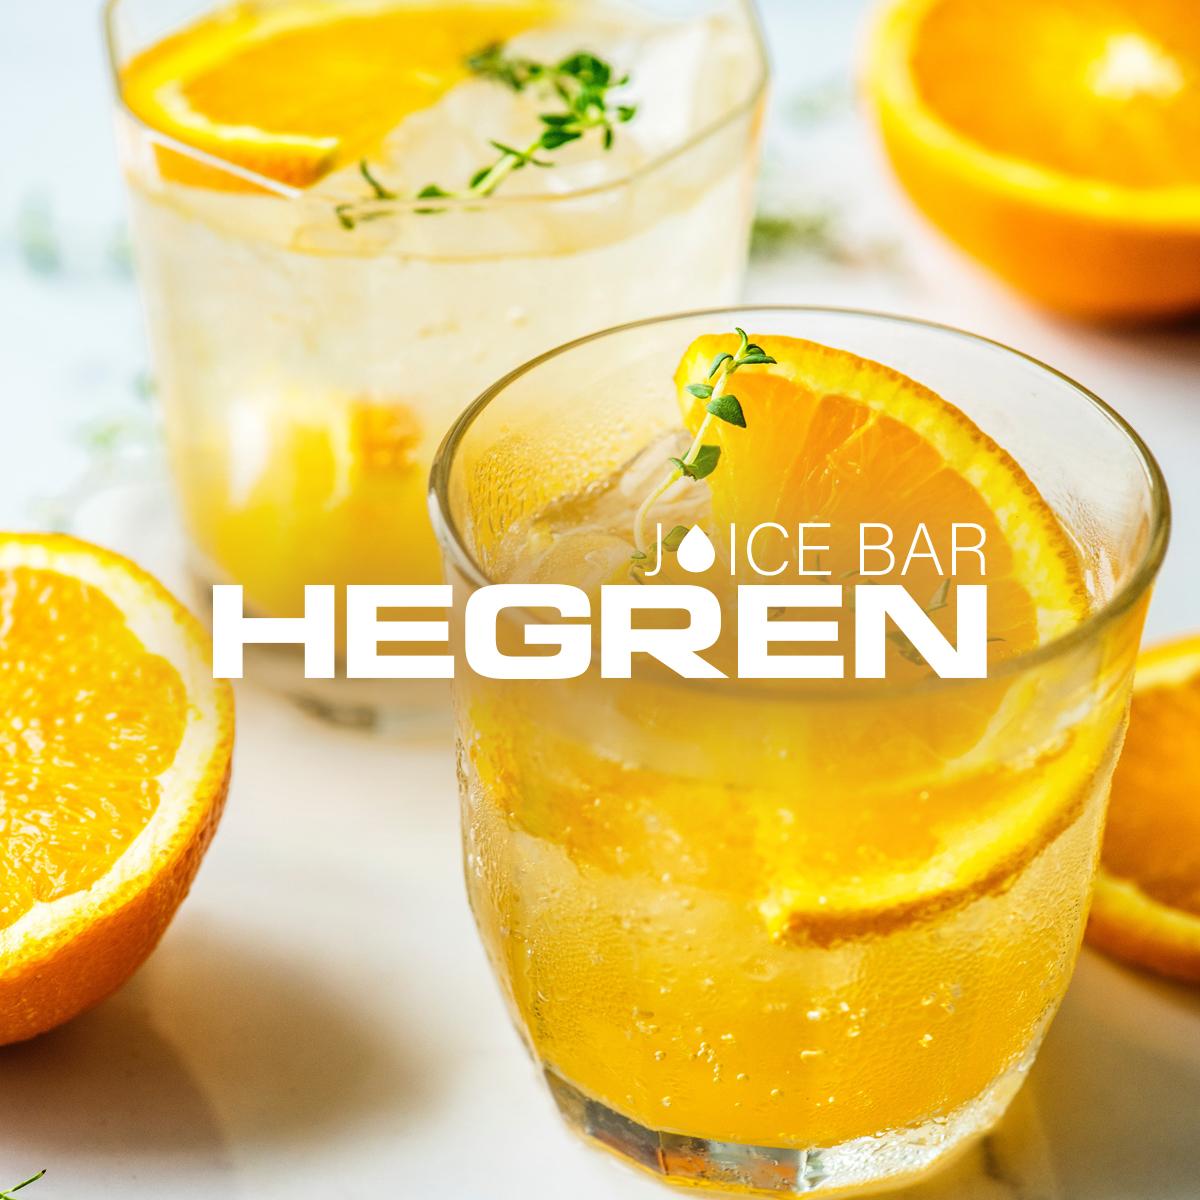 hegren-juice-bar-image_logo-1200x1200.jpg